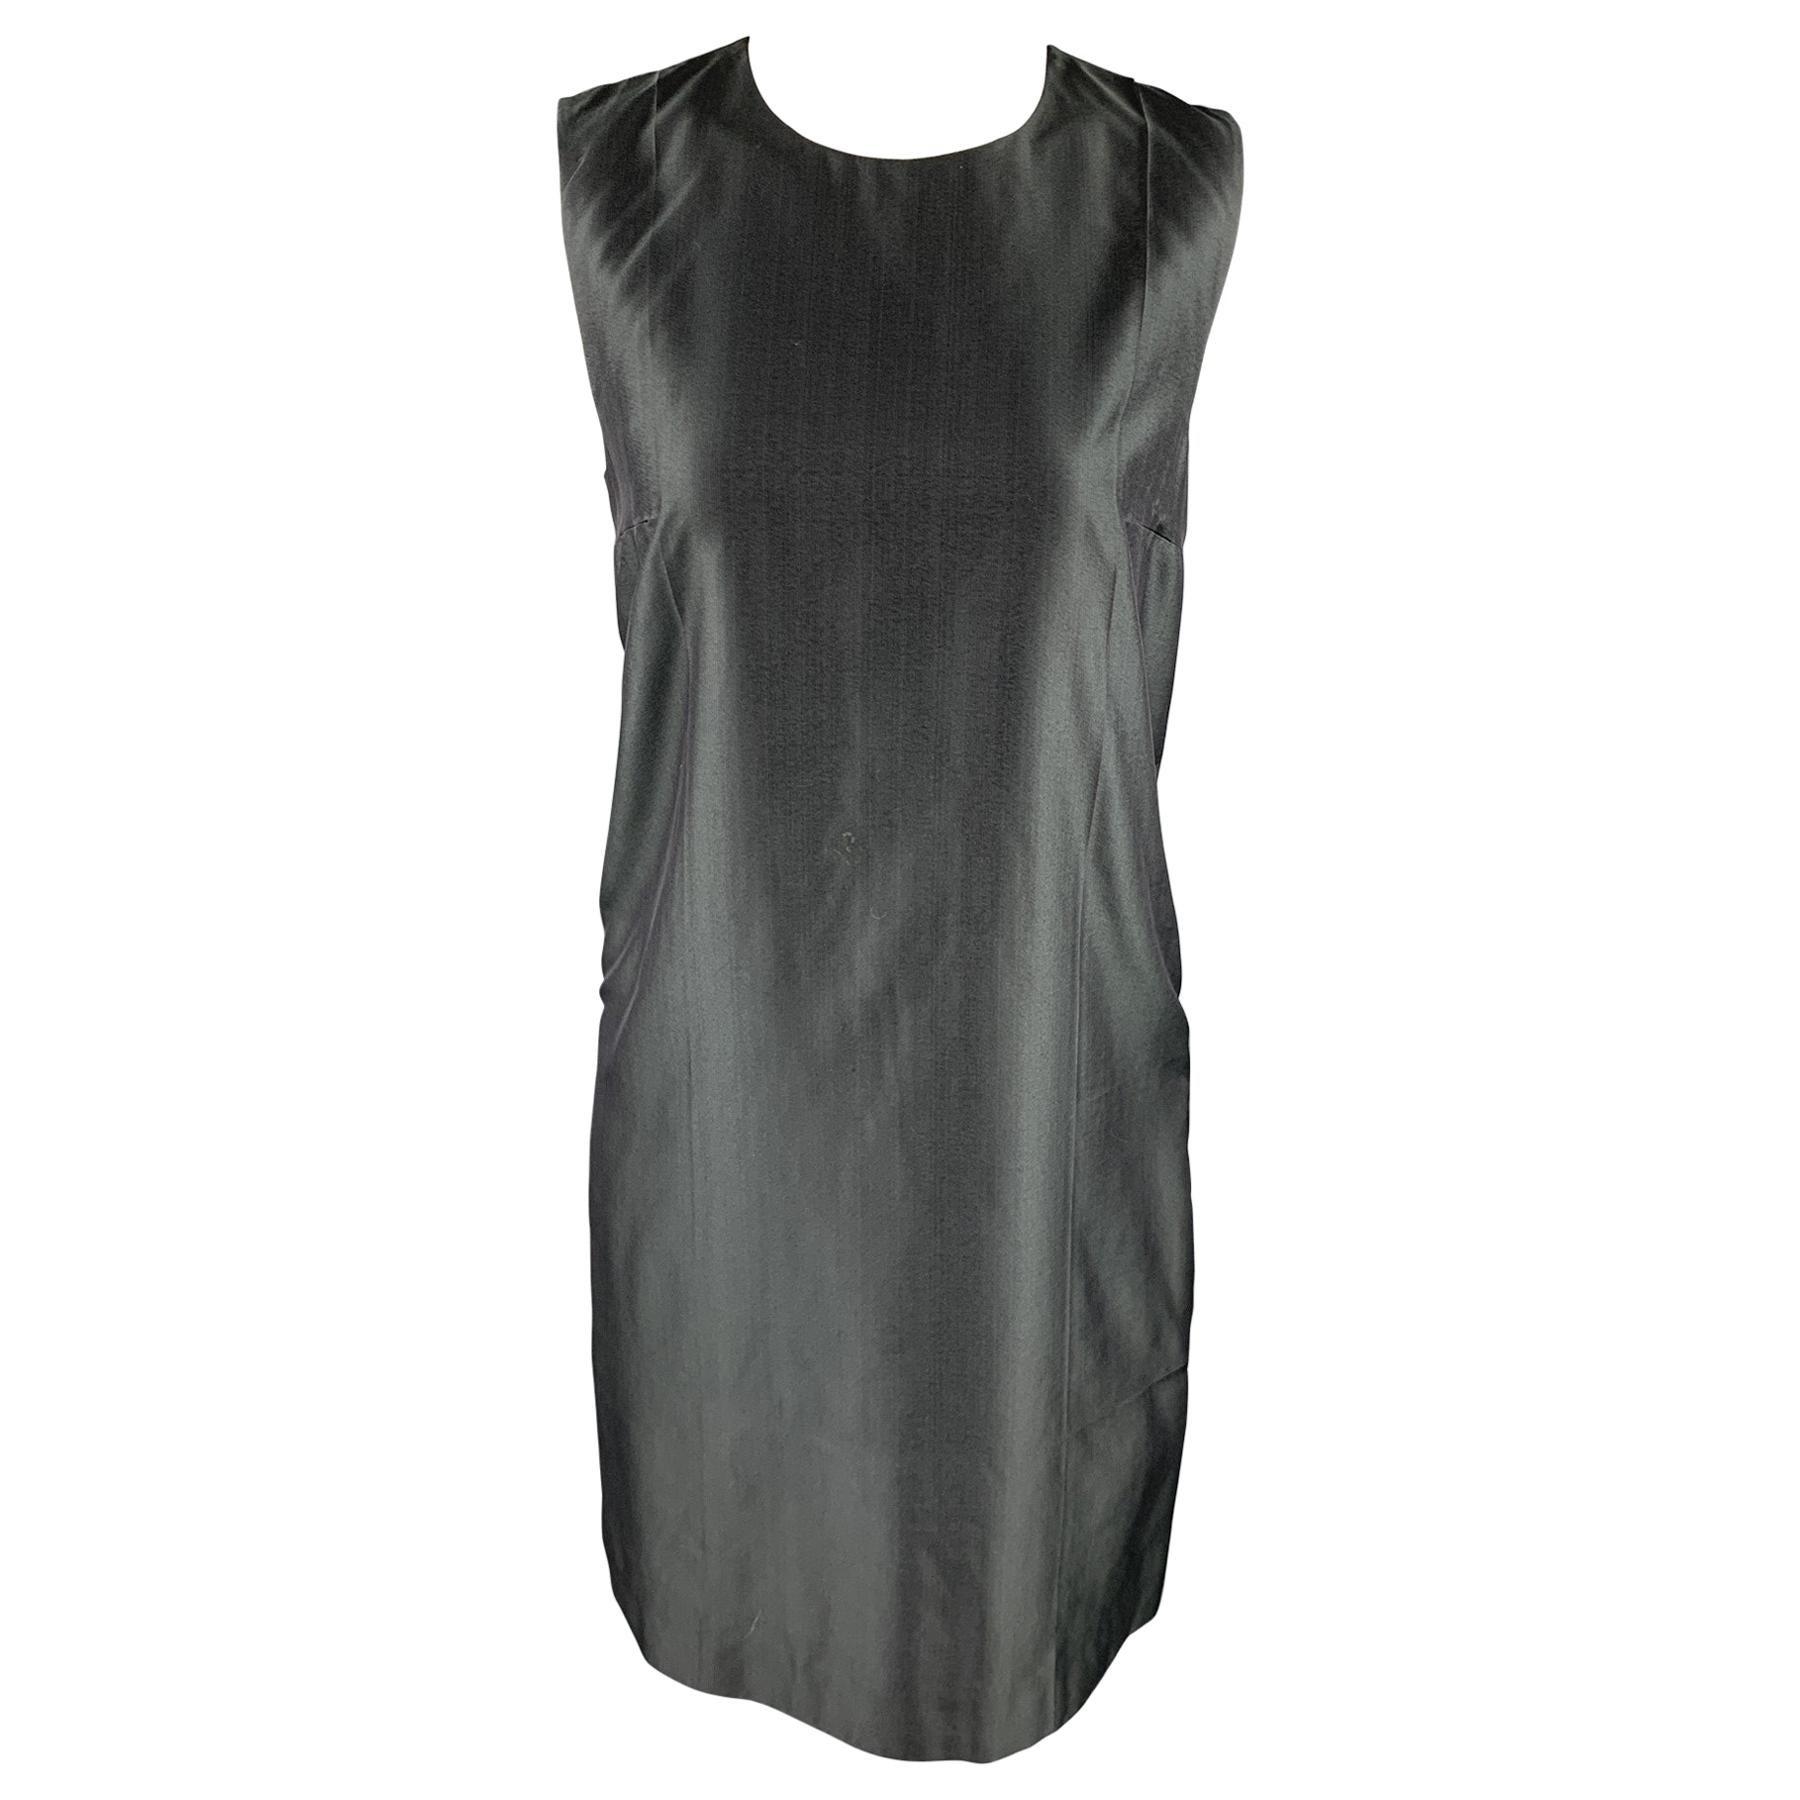 PRADA Size 6 Gray Silk Sleeveless Shift Dress